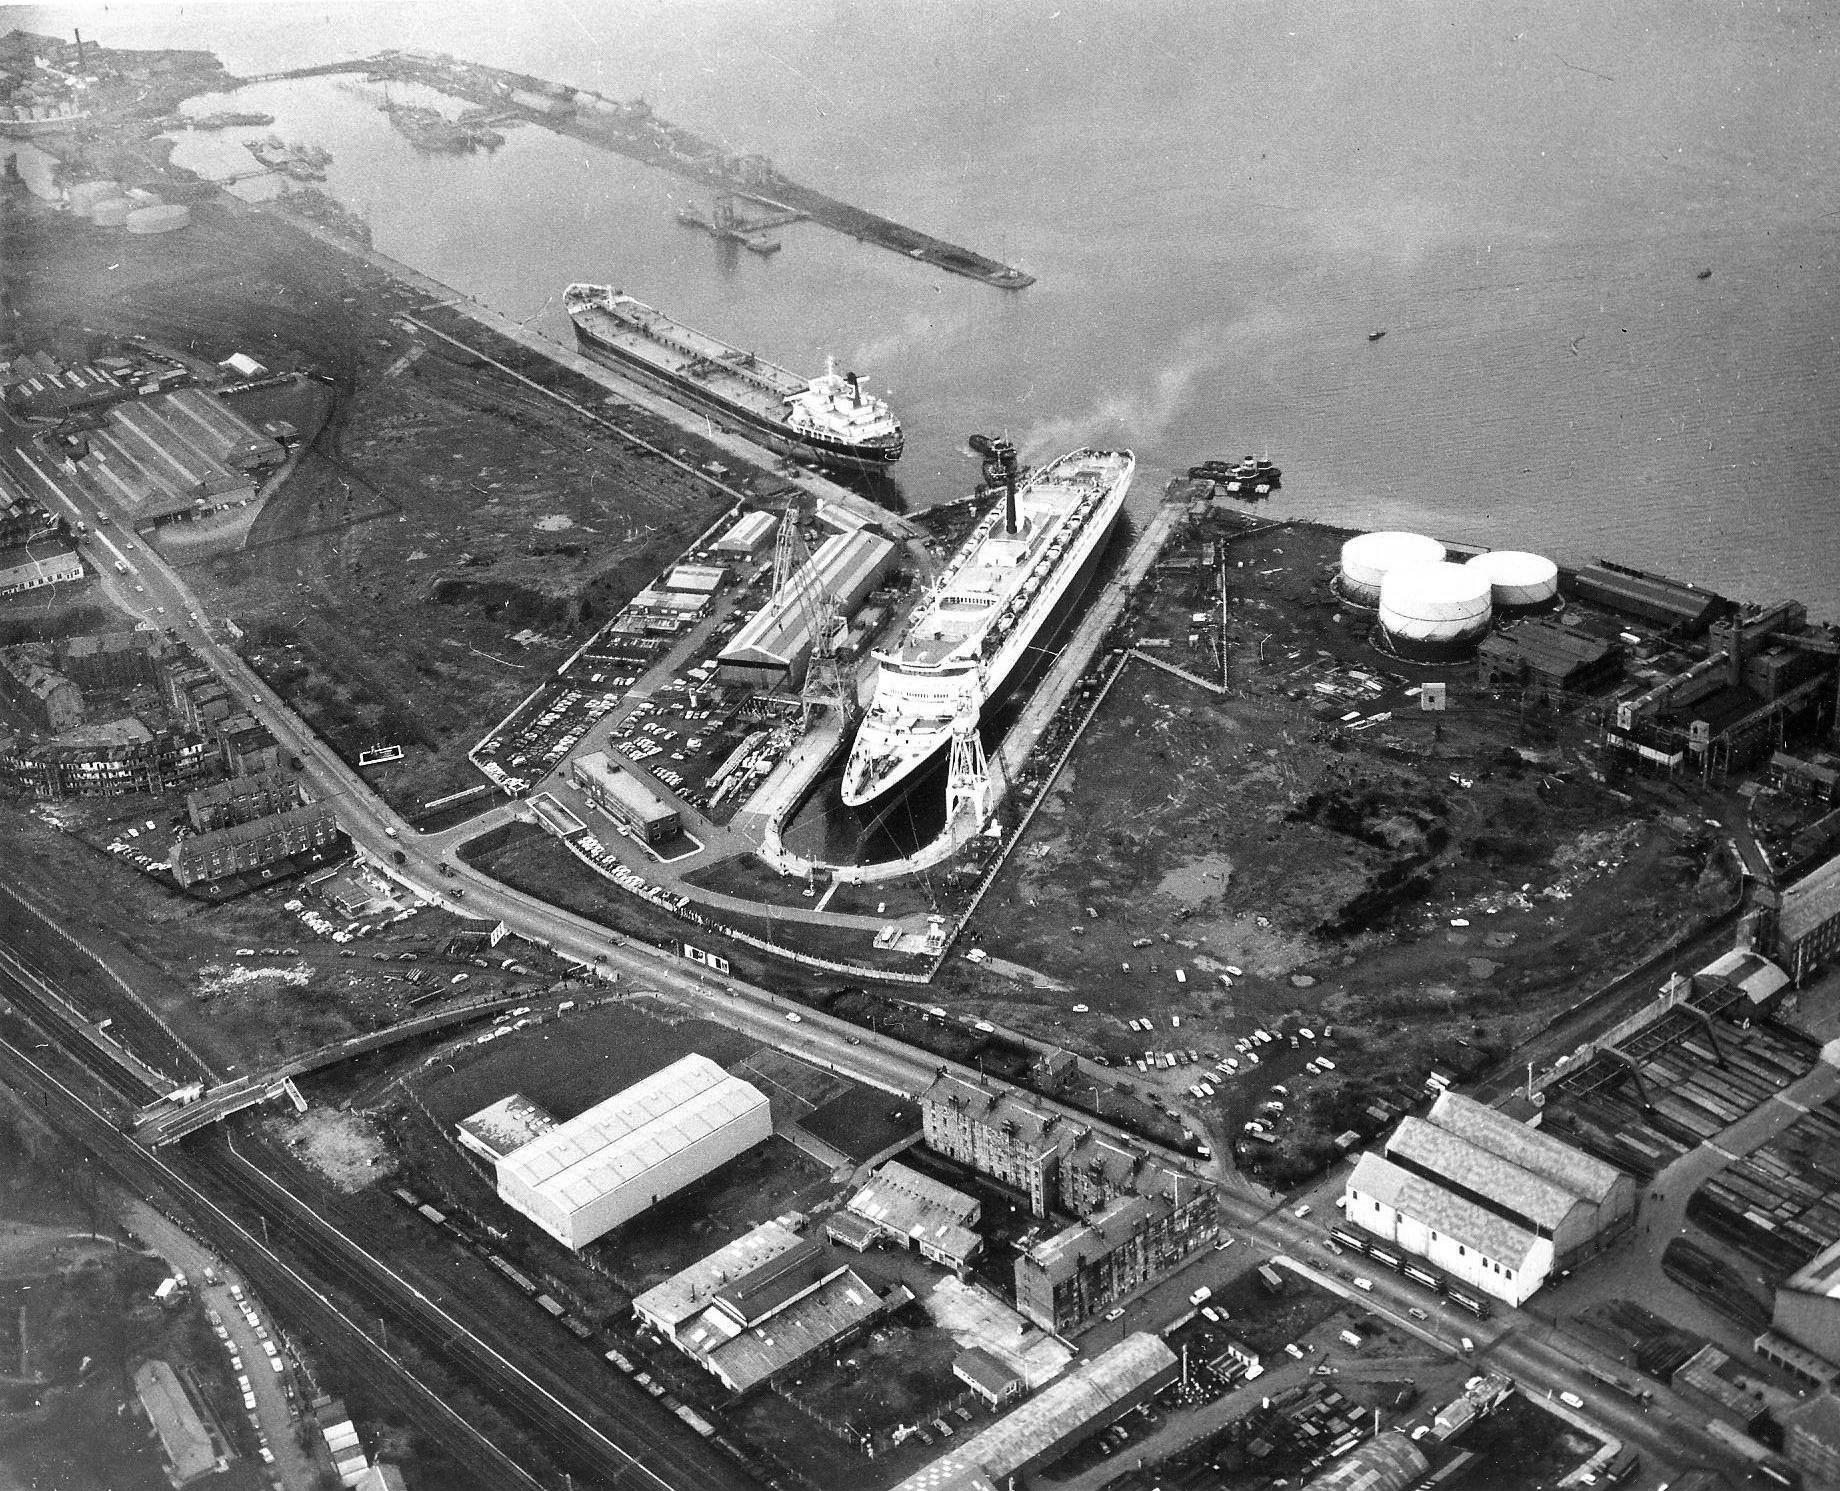 QE2 ready for sea trials at Inchgreen, Glasgow, Scotland, November 1968